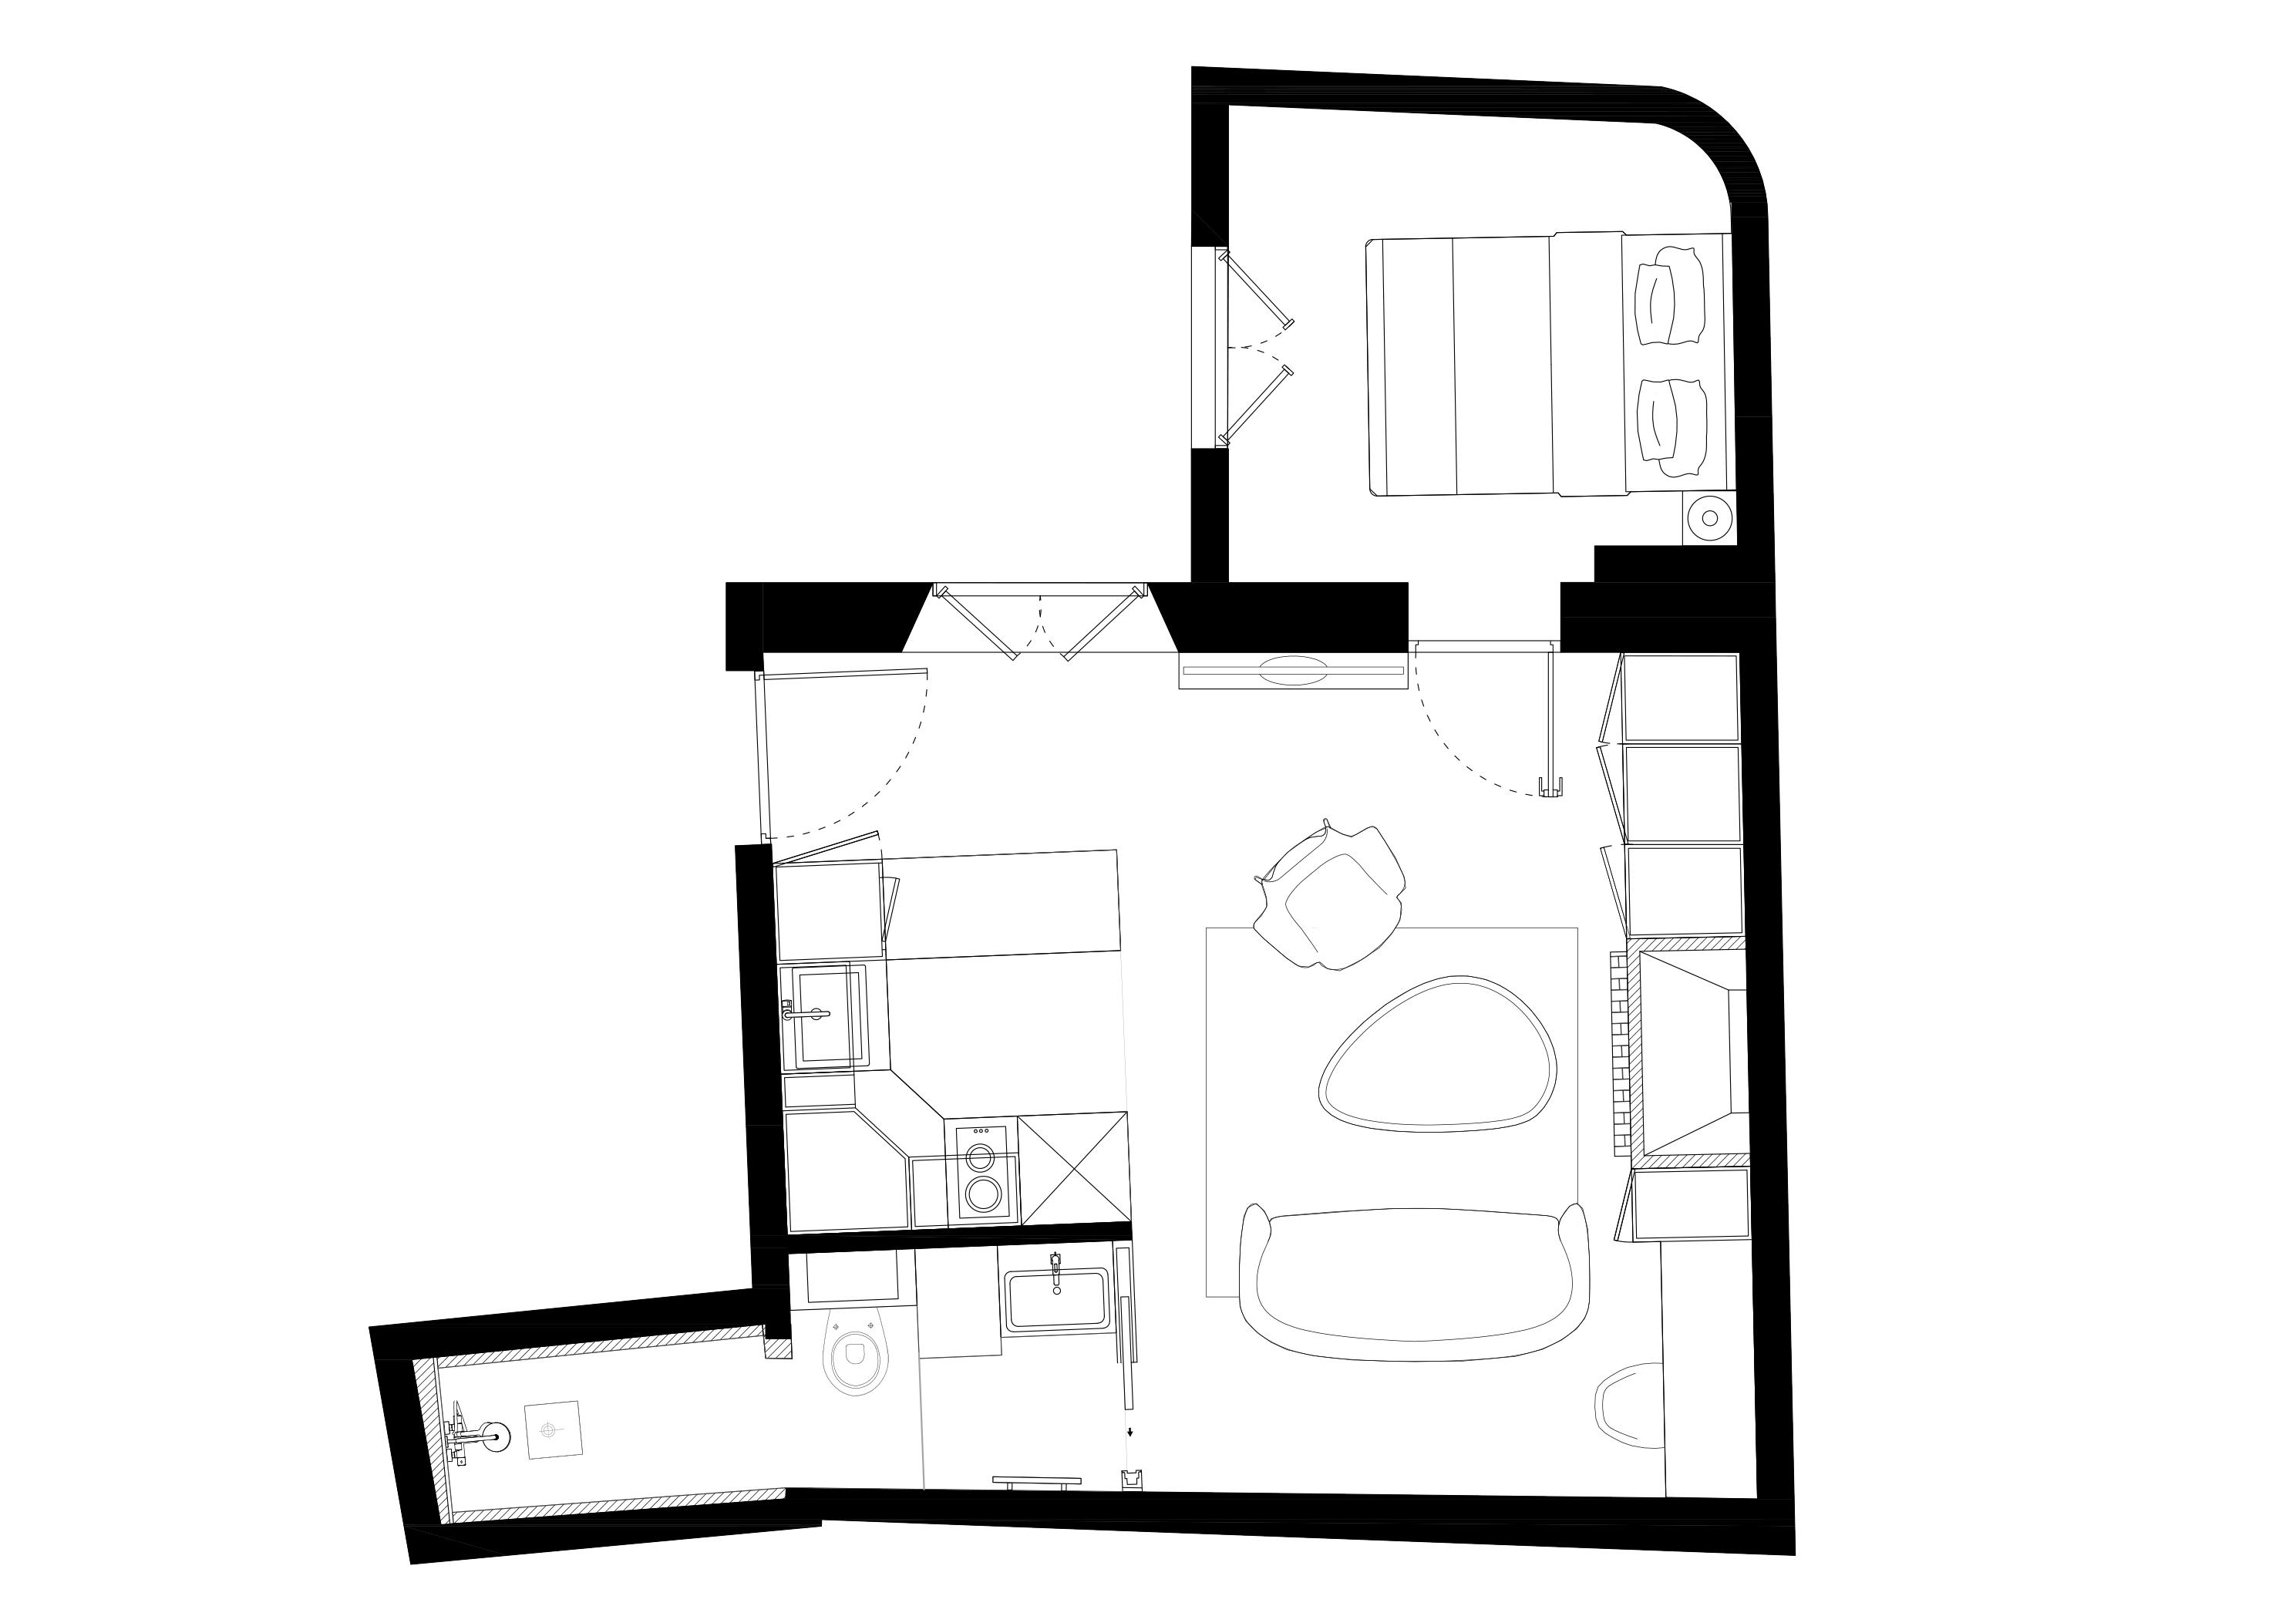 plan site 2